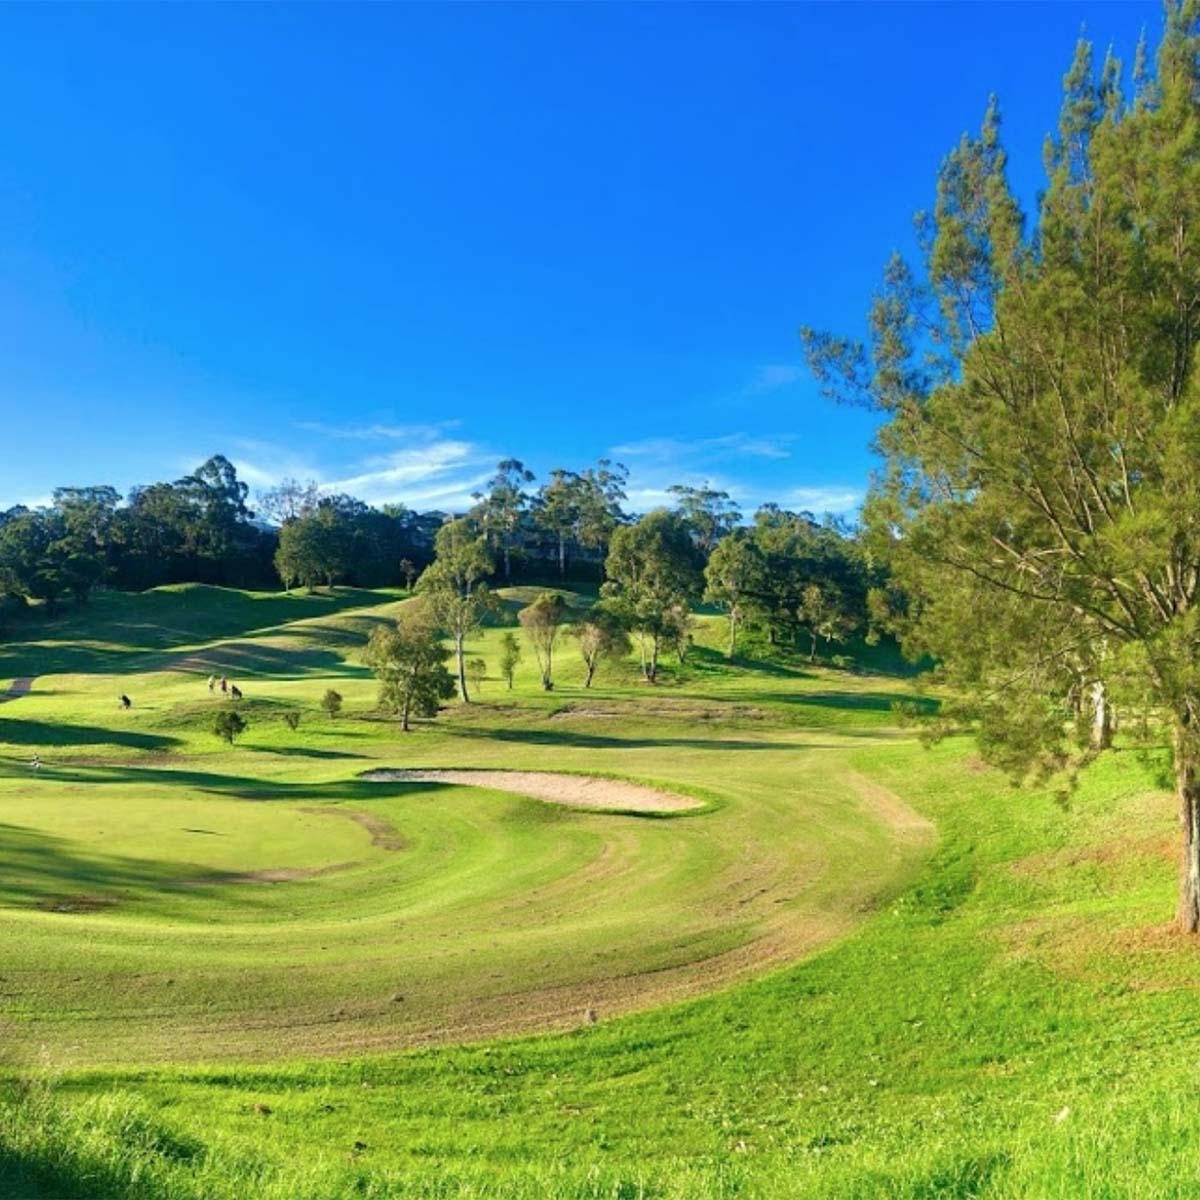 scenes around Bardwell Valley Golf Club